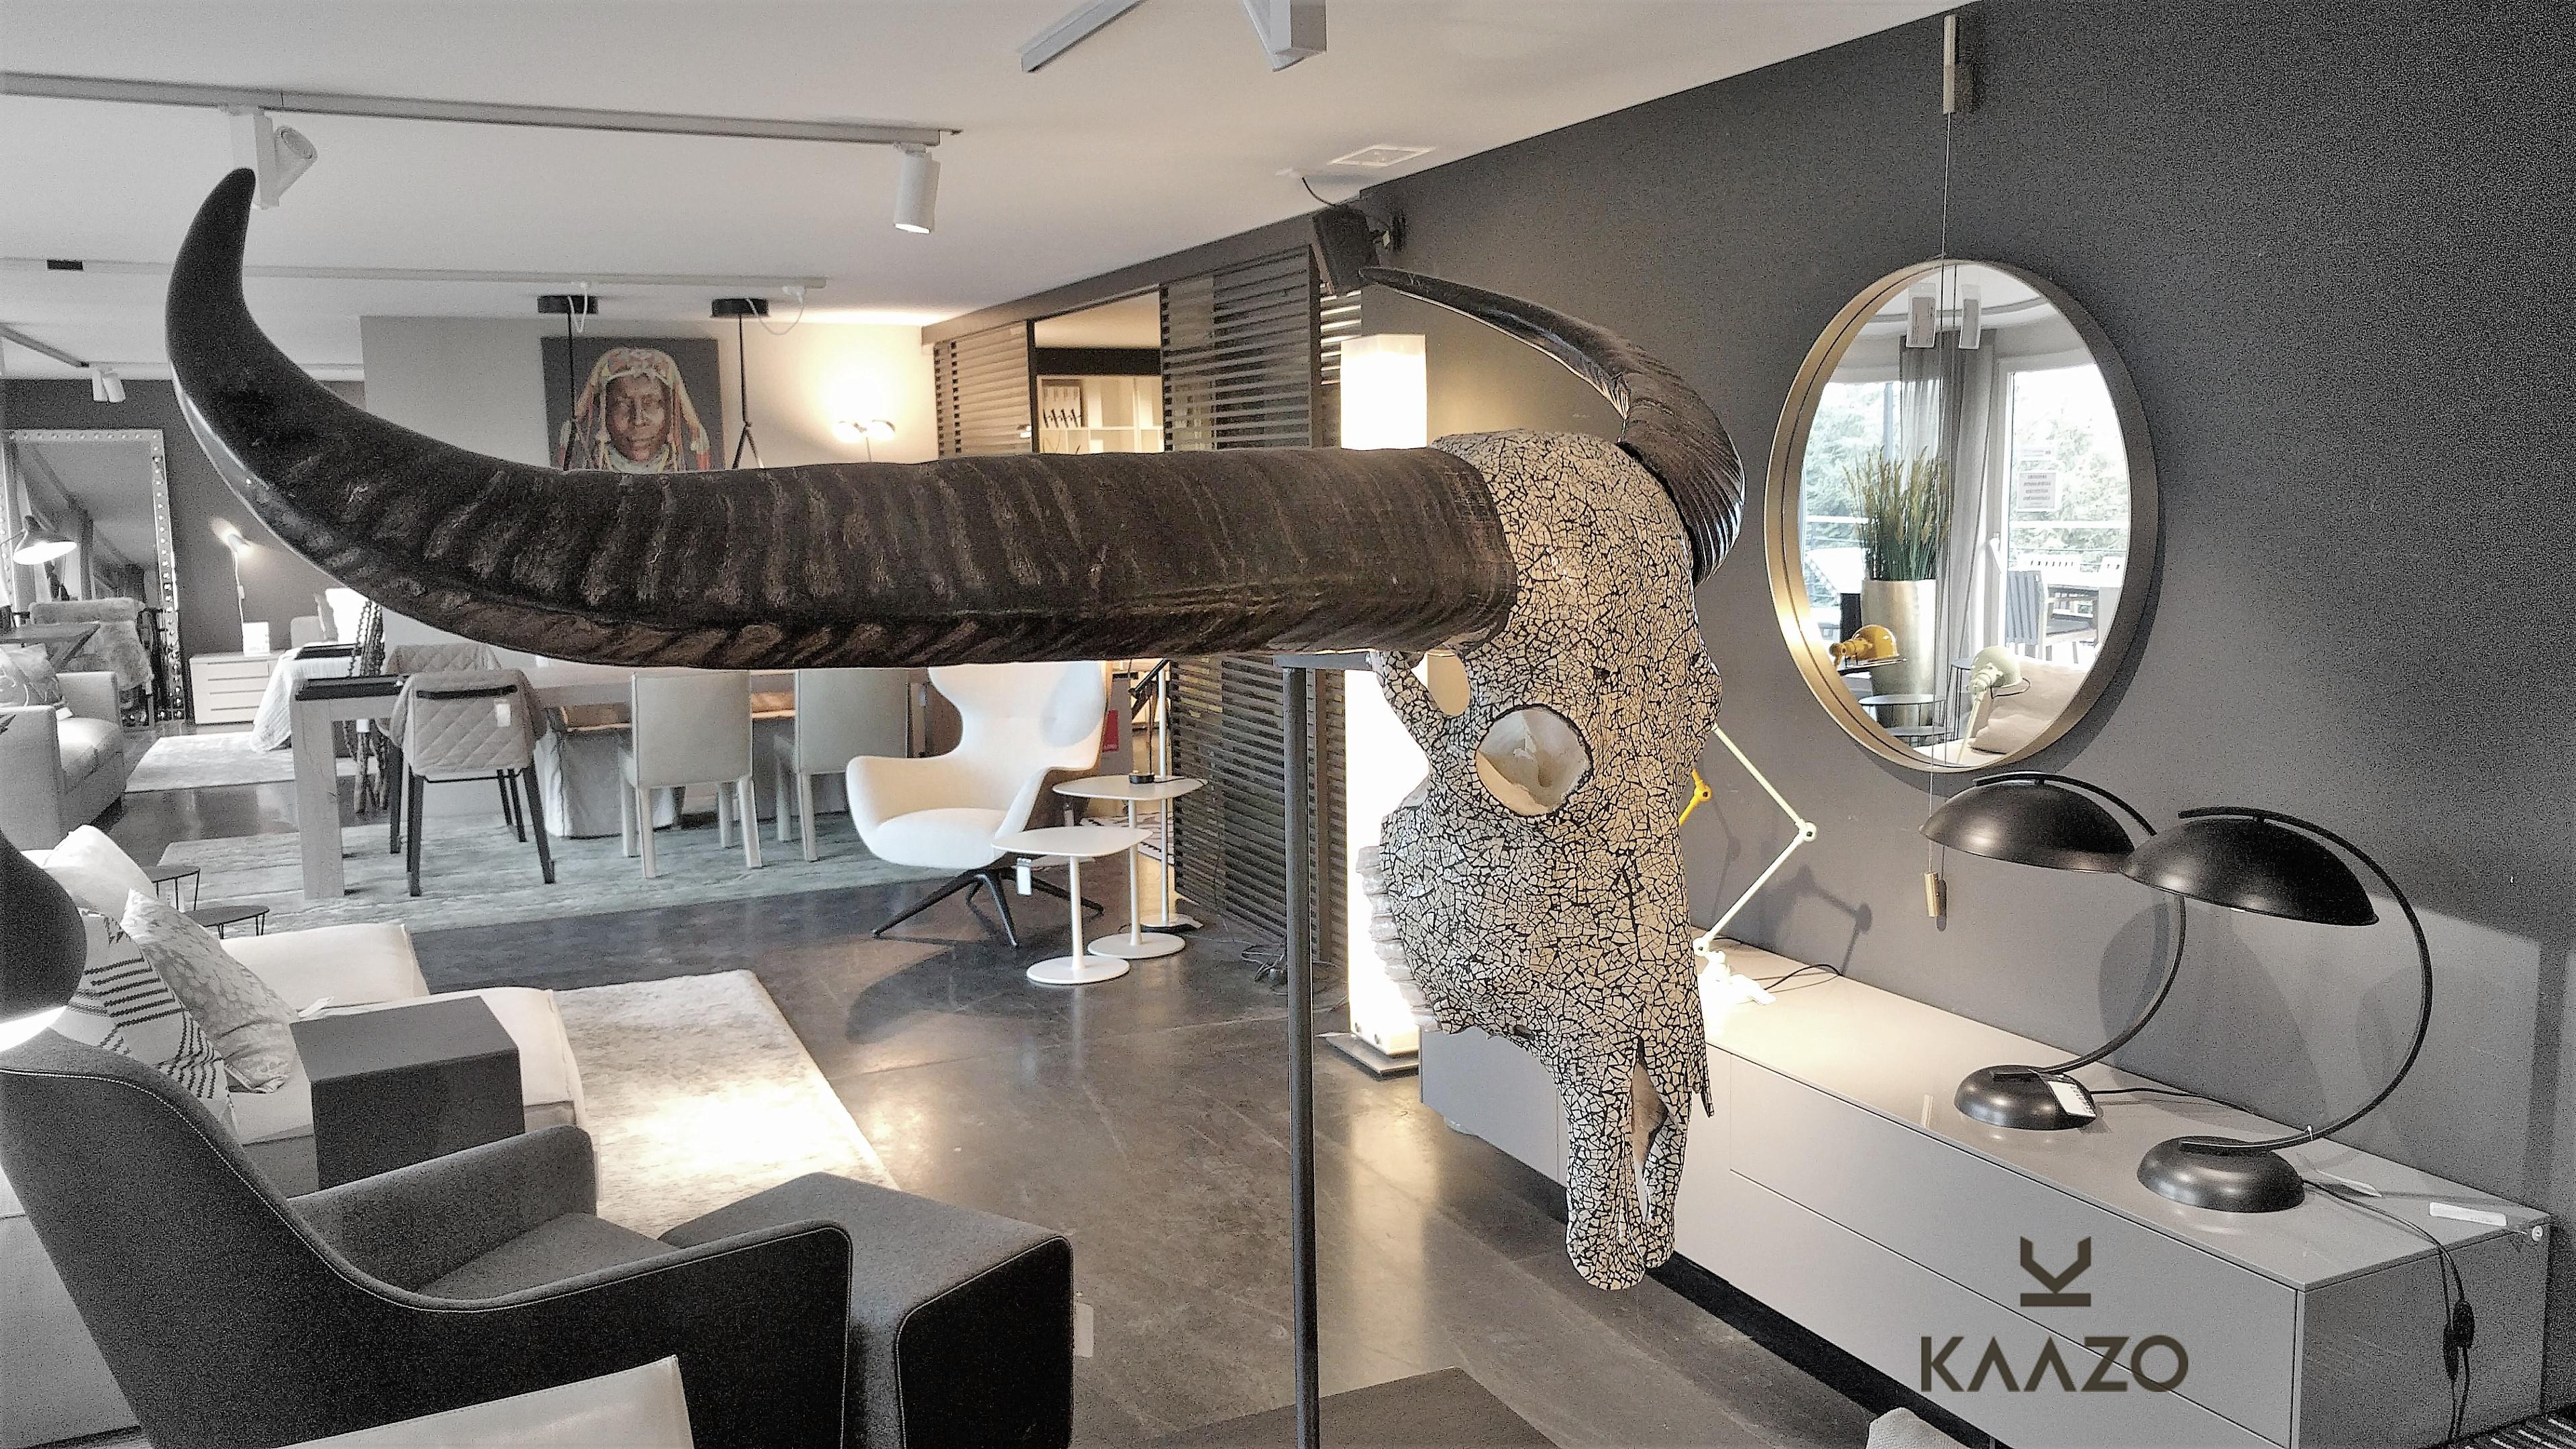 Kaazo South Africa Ostrich Eggshell Mosaic Buffalo Skull